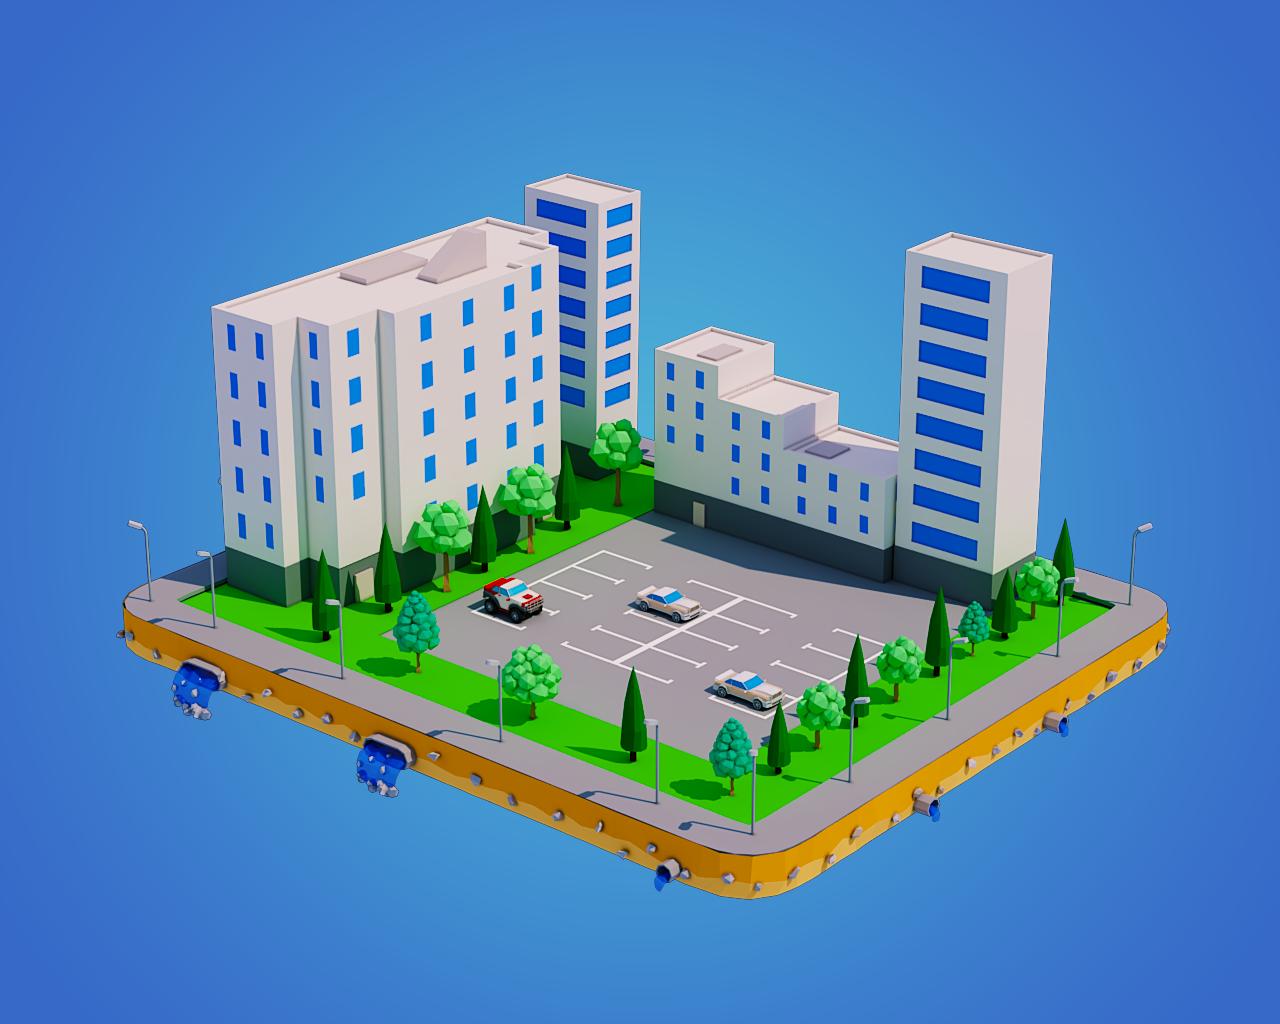 Low Poly City Block 3D Model in Cityscapes 3DExport